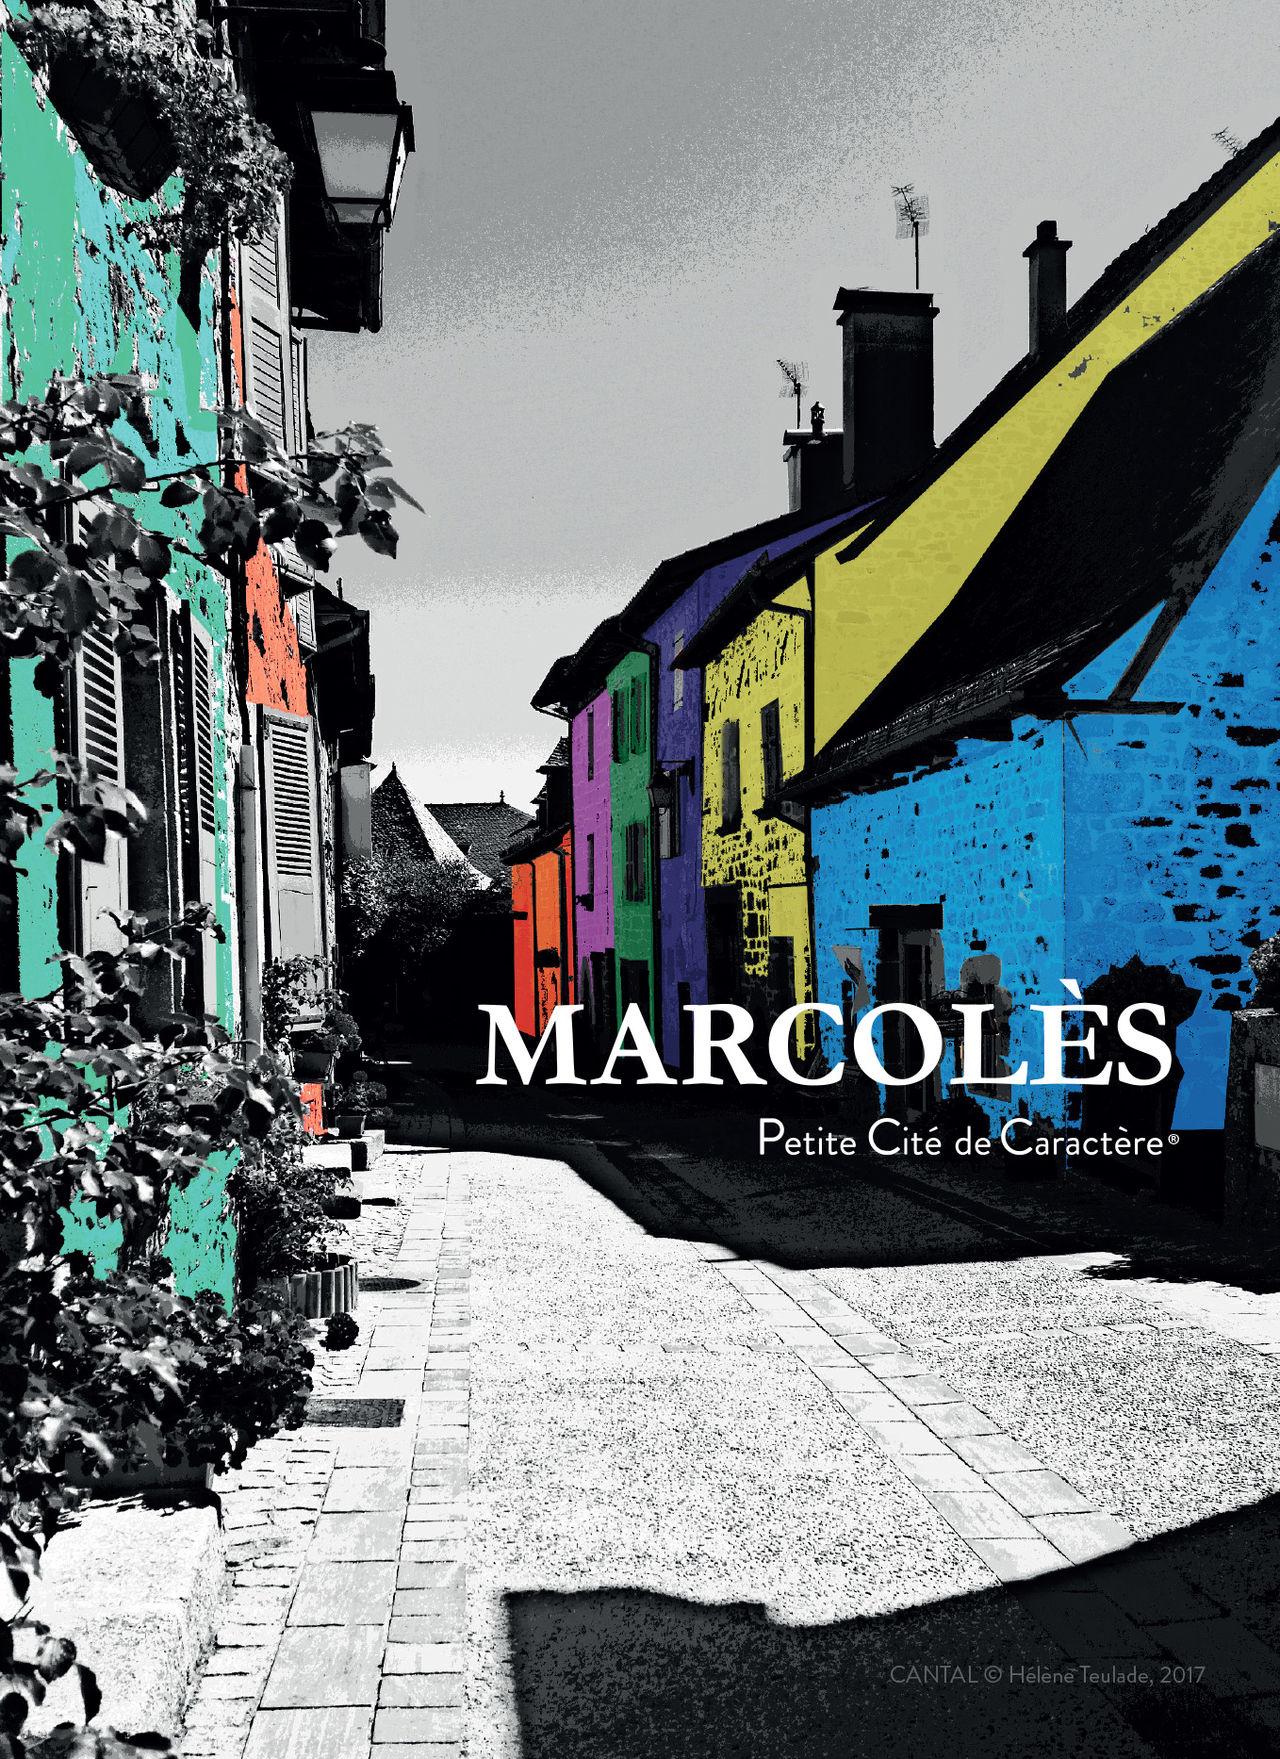 Marcolès